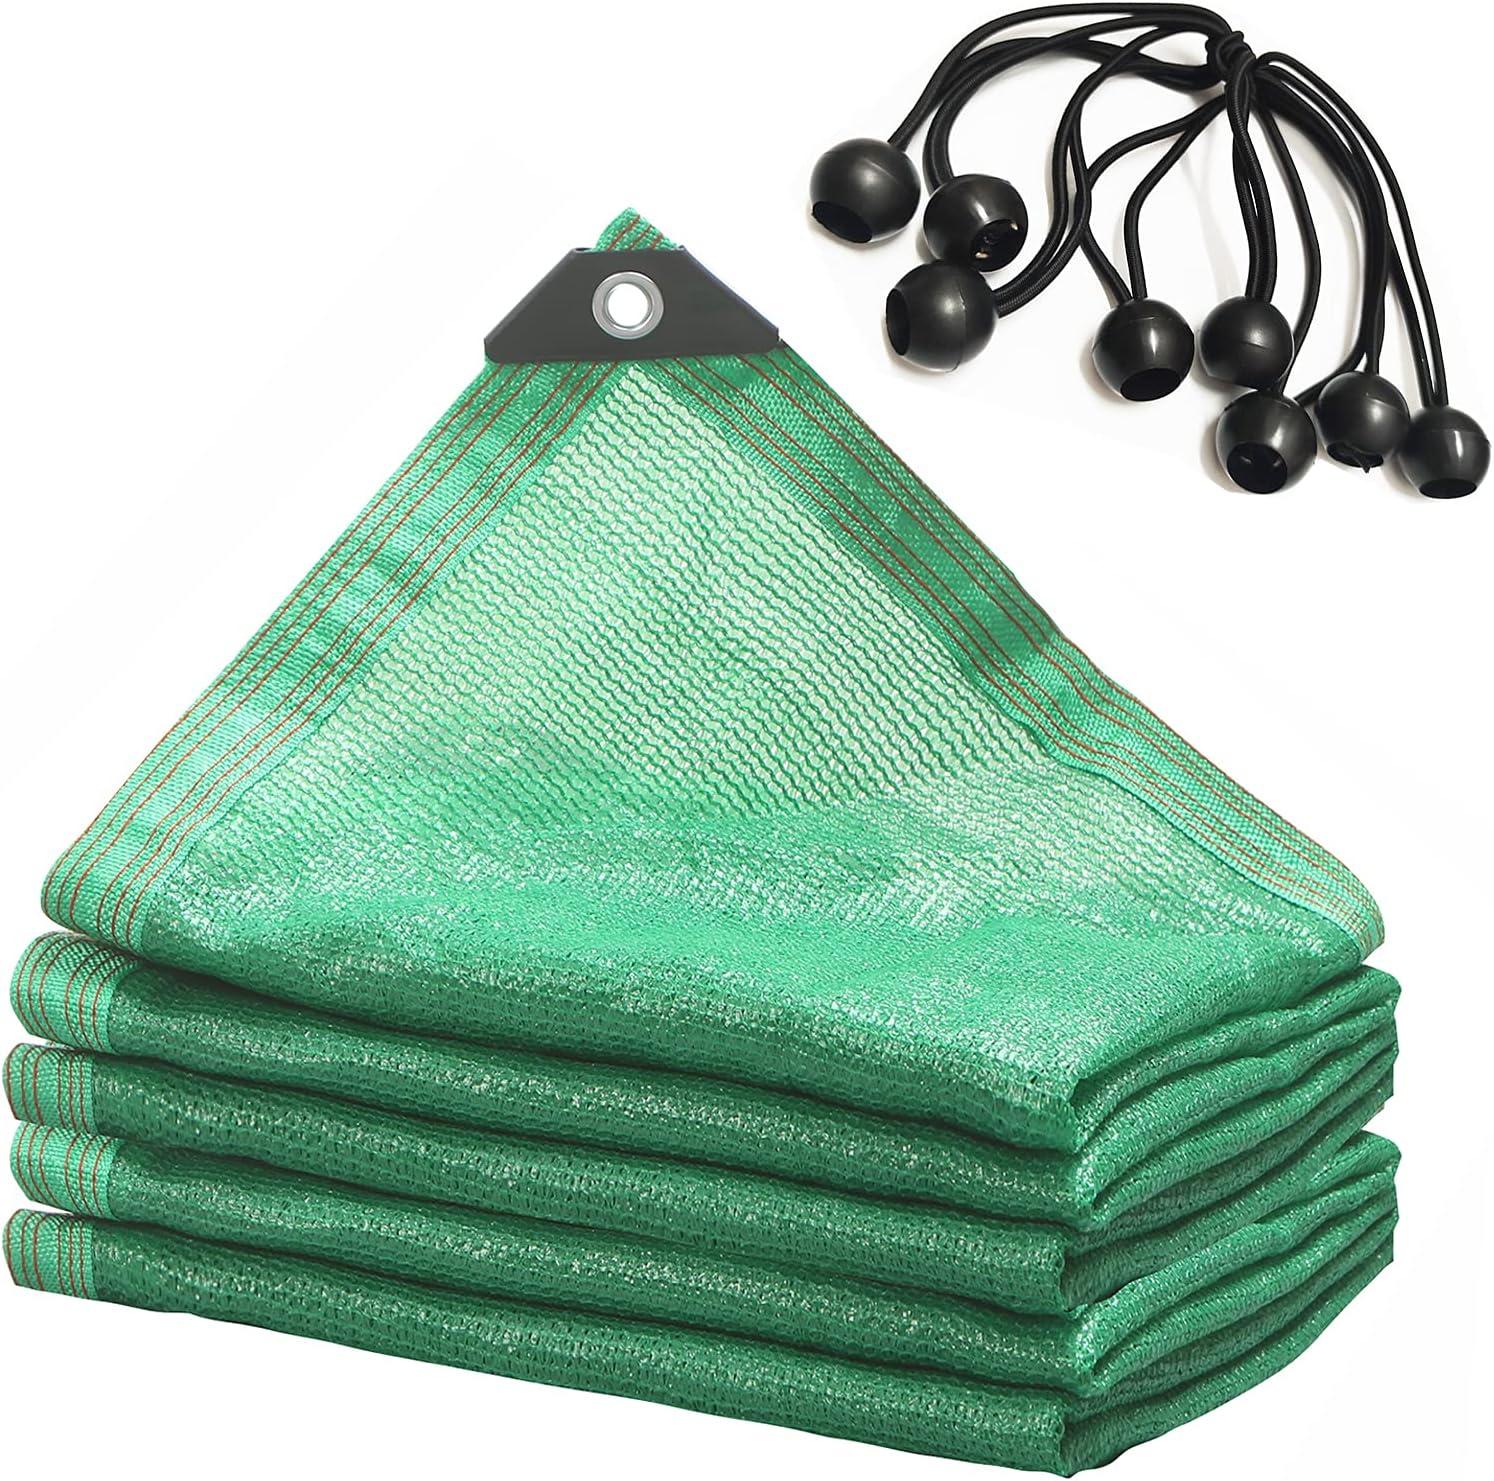 shop None Brand Sunblock Shade Cloth Fabric Ta Covers Greenhouse Mesh High quality